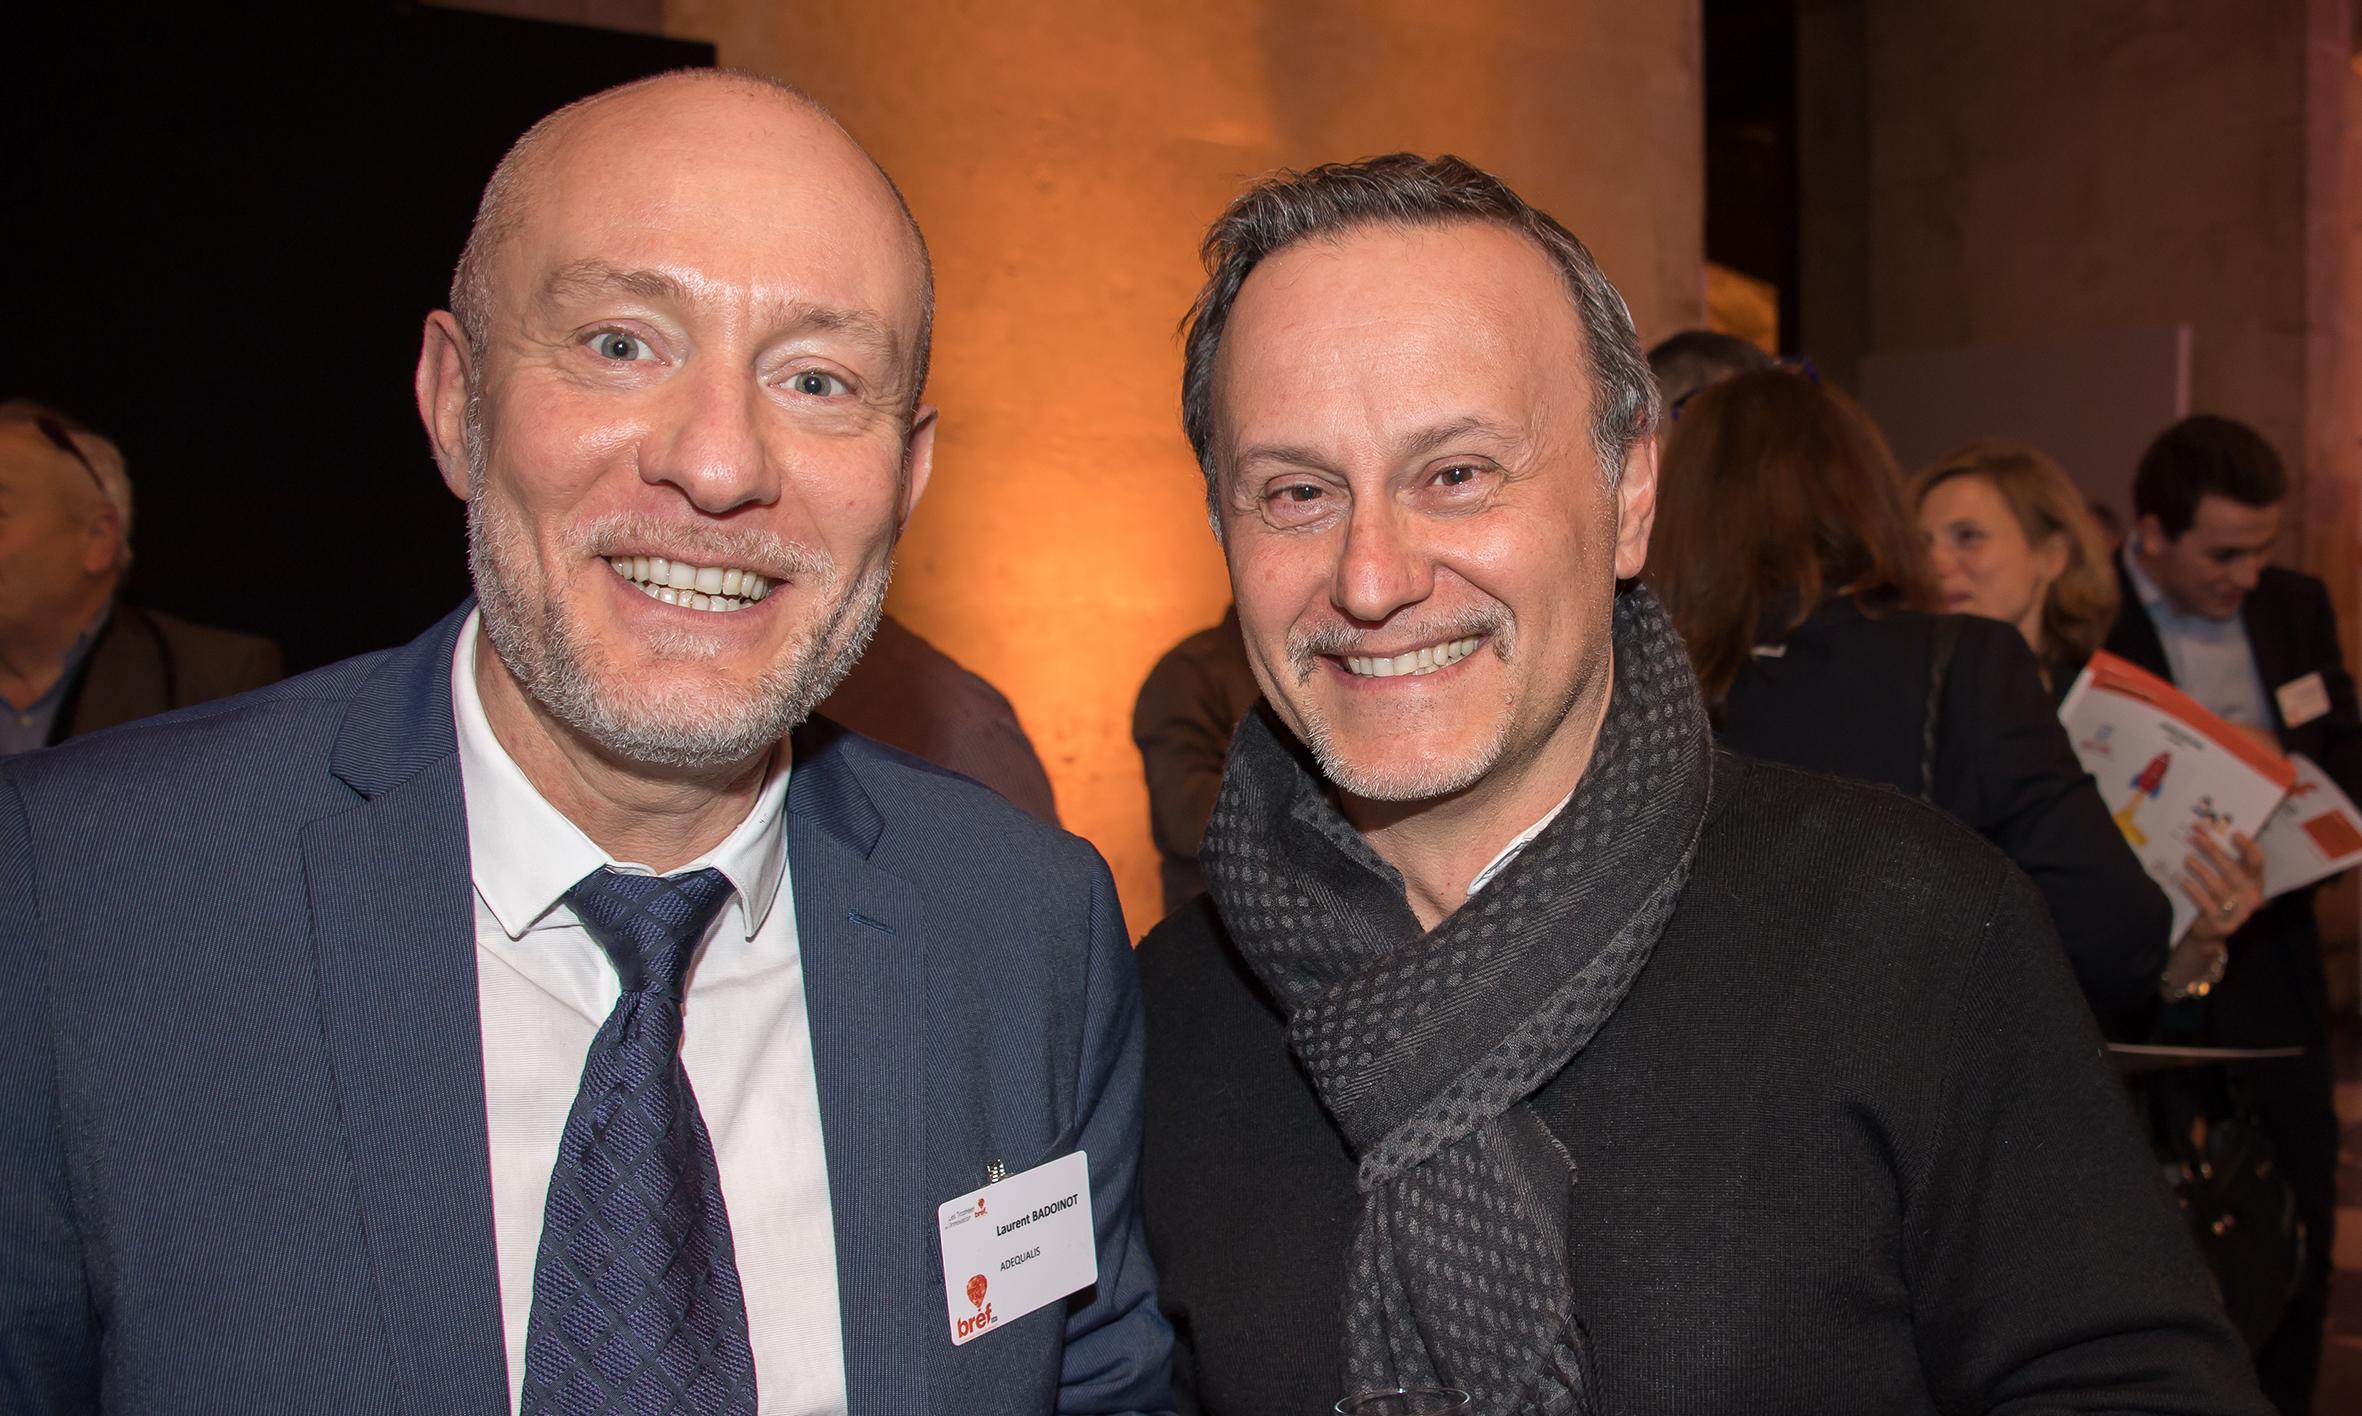 Les troph es bref eco de l 39 innovation bref eco for Dujardin nimes